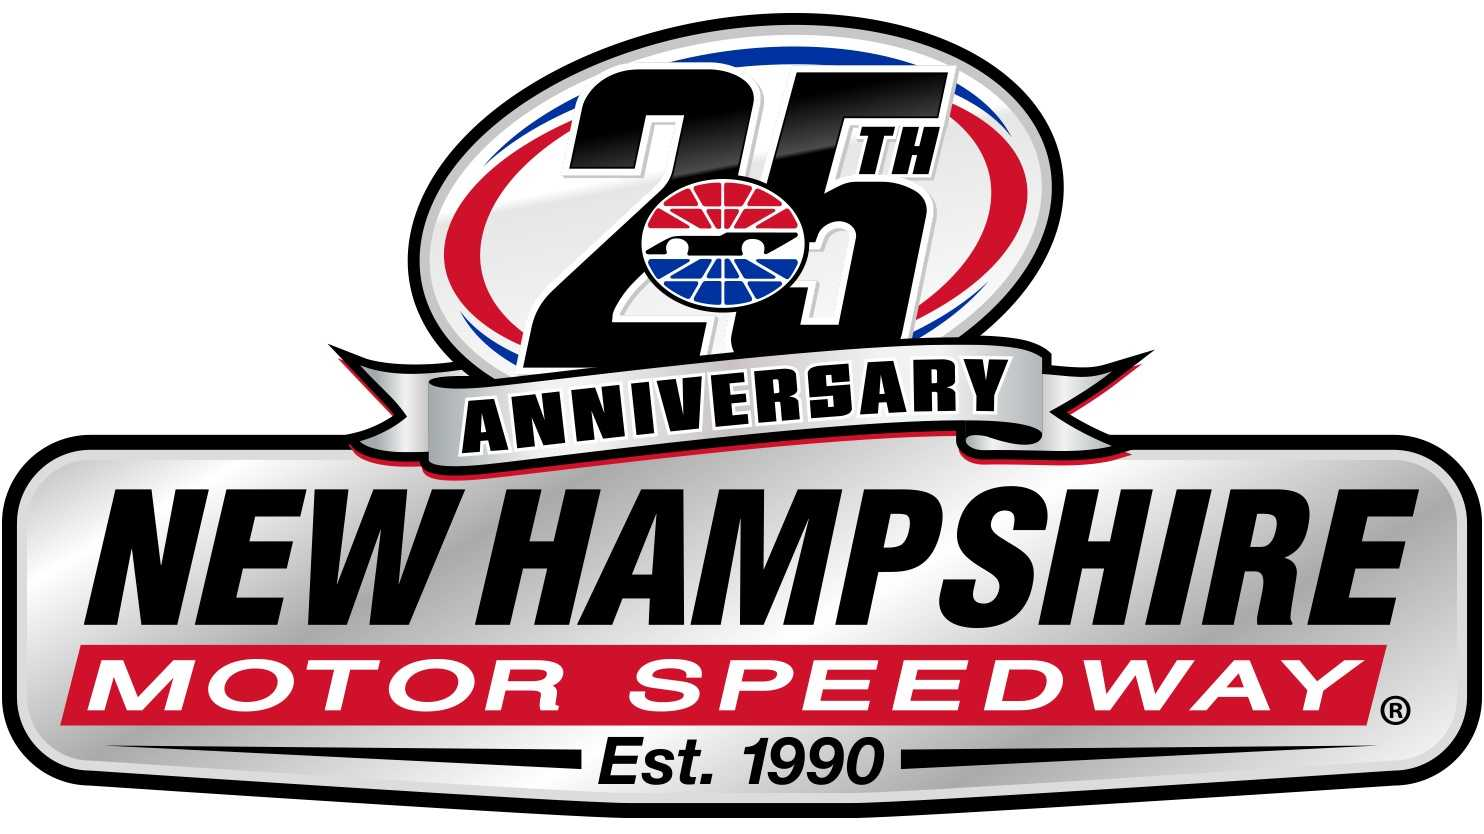 NHMS 25th anniversary logo